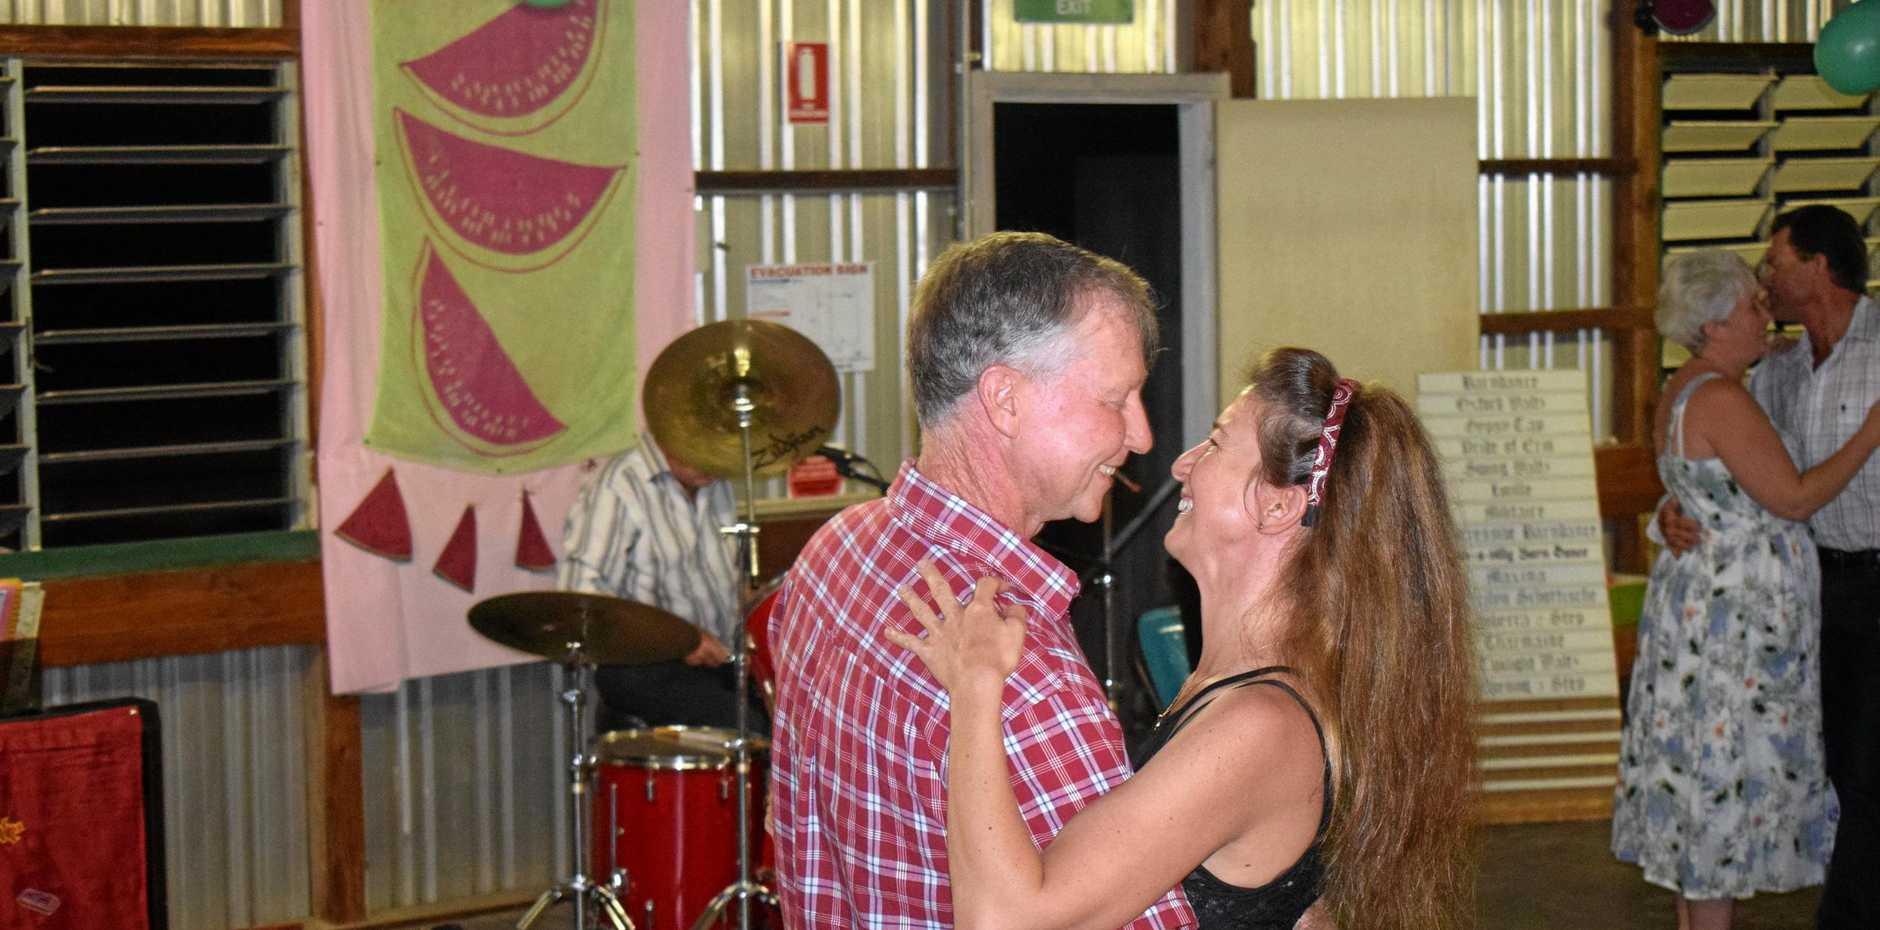 John Prior and Zita Stark at the Cameby Hall Melontine Dance - Saturday Feb 9, 2019.